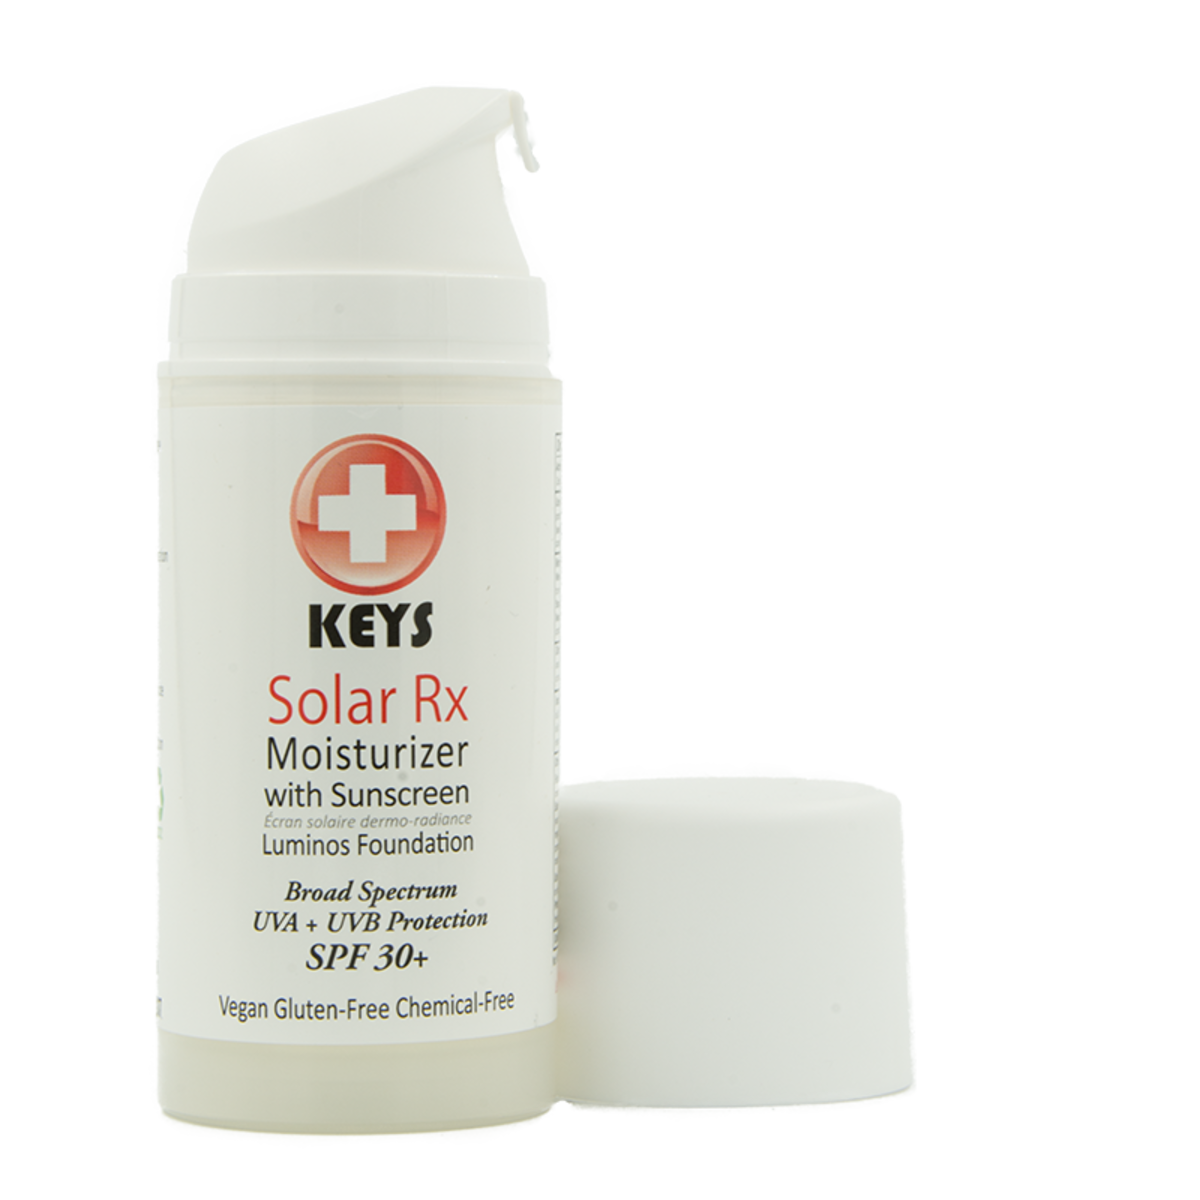 KEYS Solar Rx Hydrating Moisturizer SPF 30+ Sunscreen